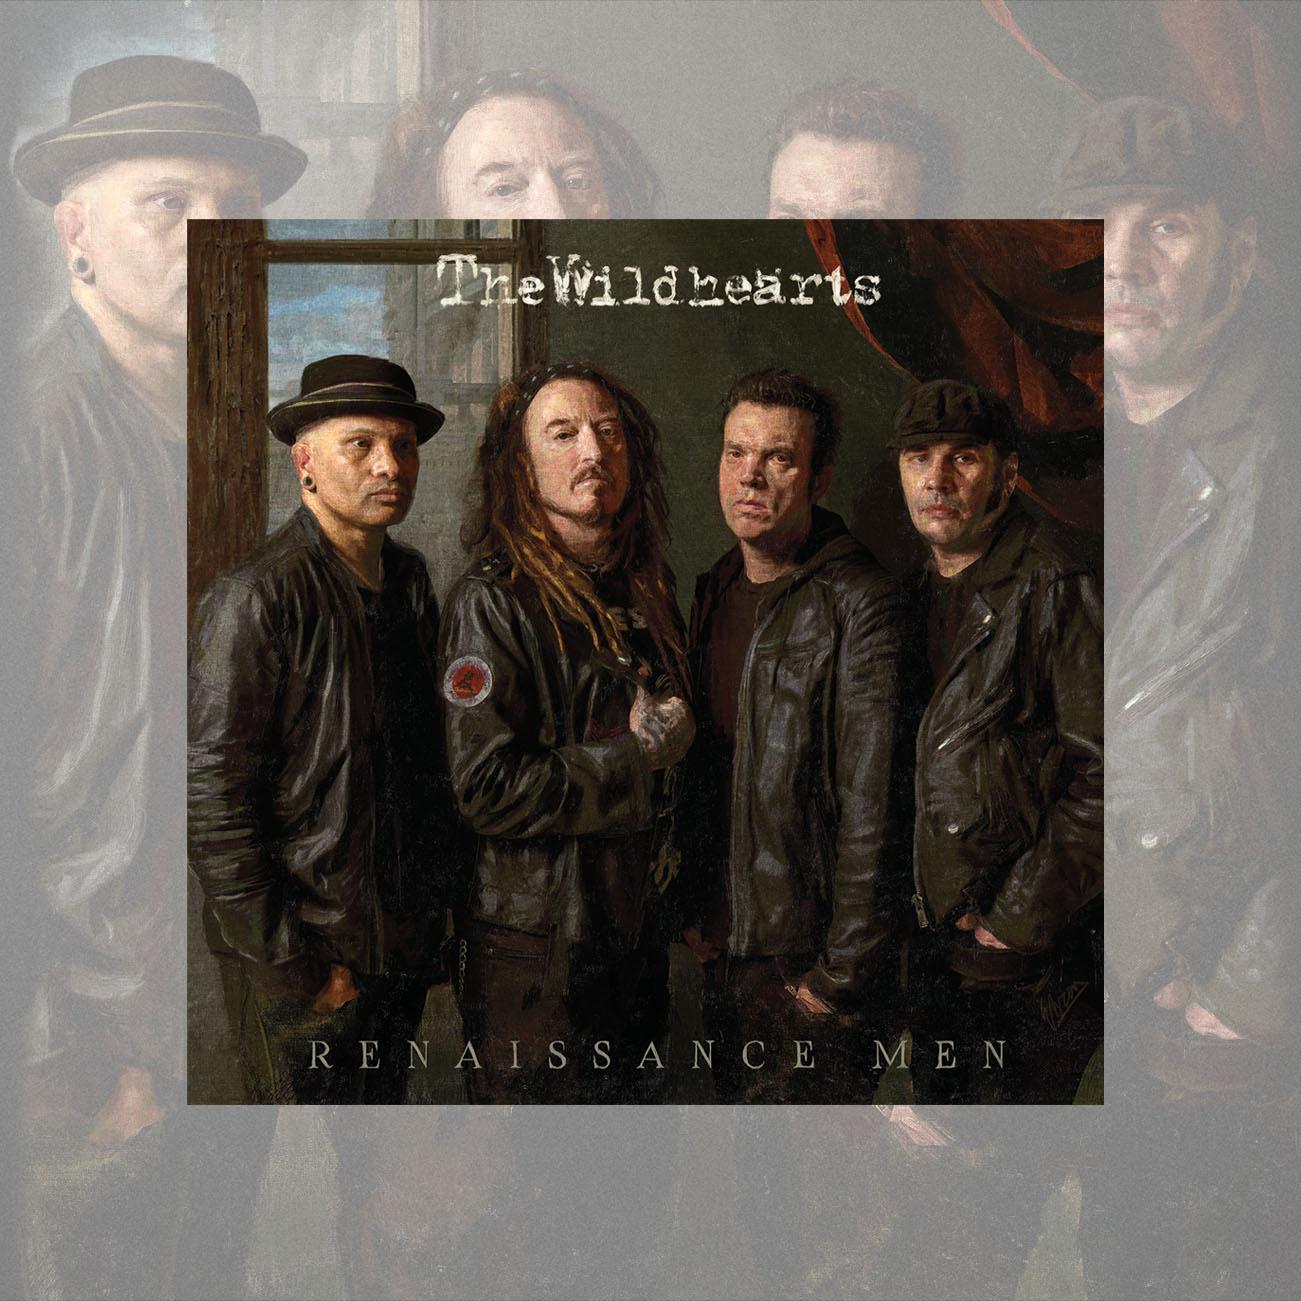 The Wildhearts - Renaissance Men - Digital Album - Graphite Music